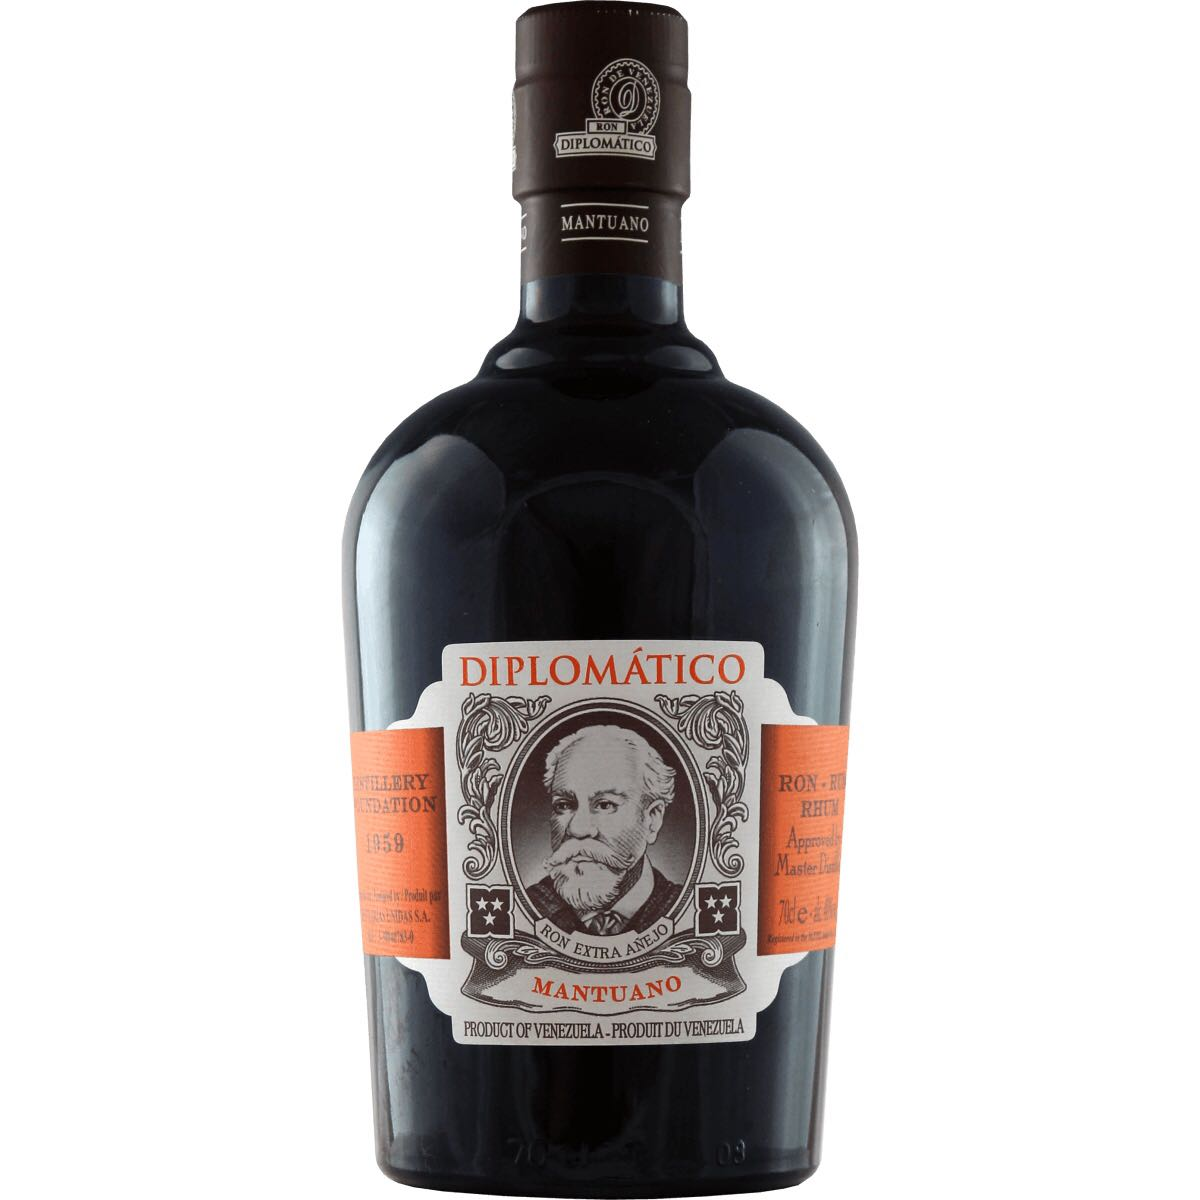 Bottle image of Diplomático / Botucal Mantuano